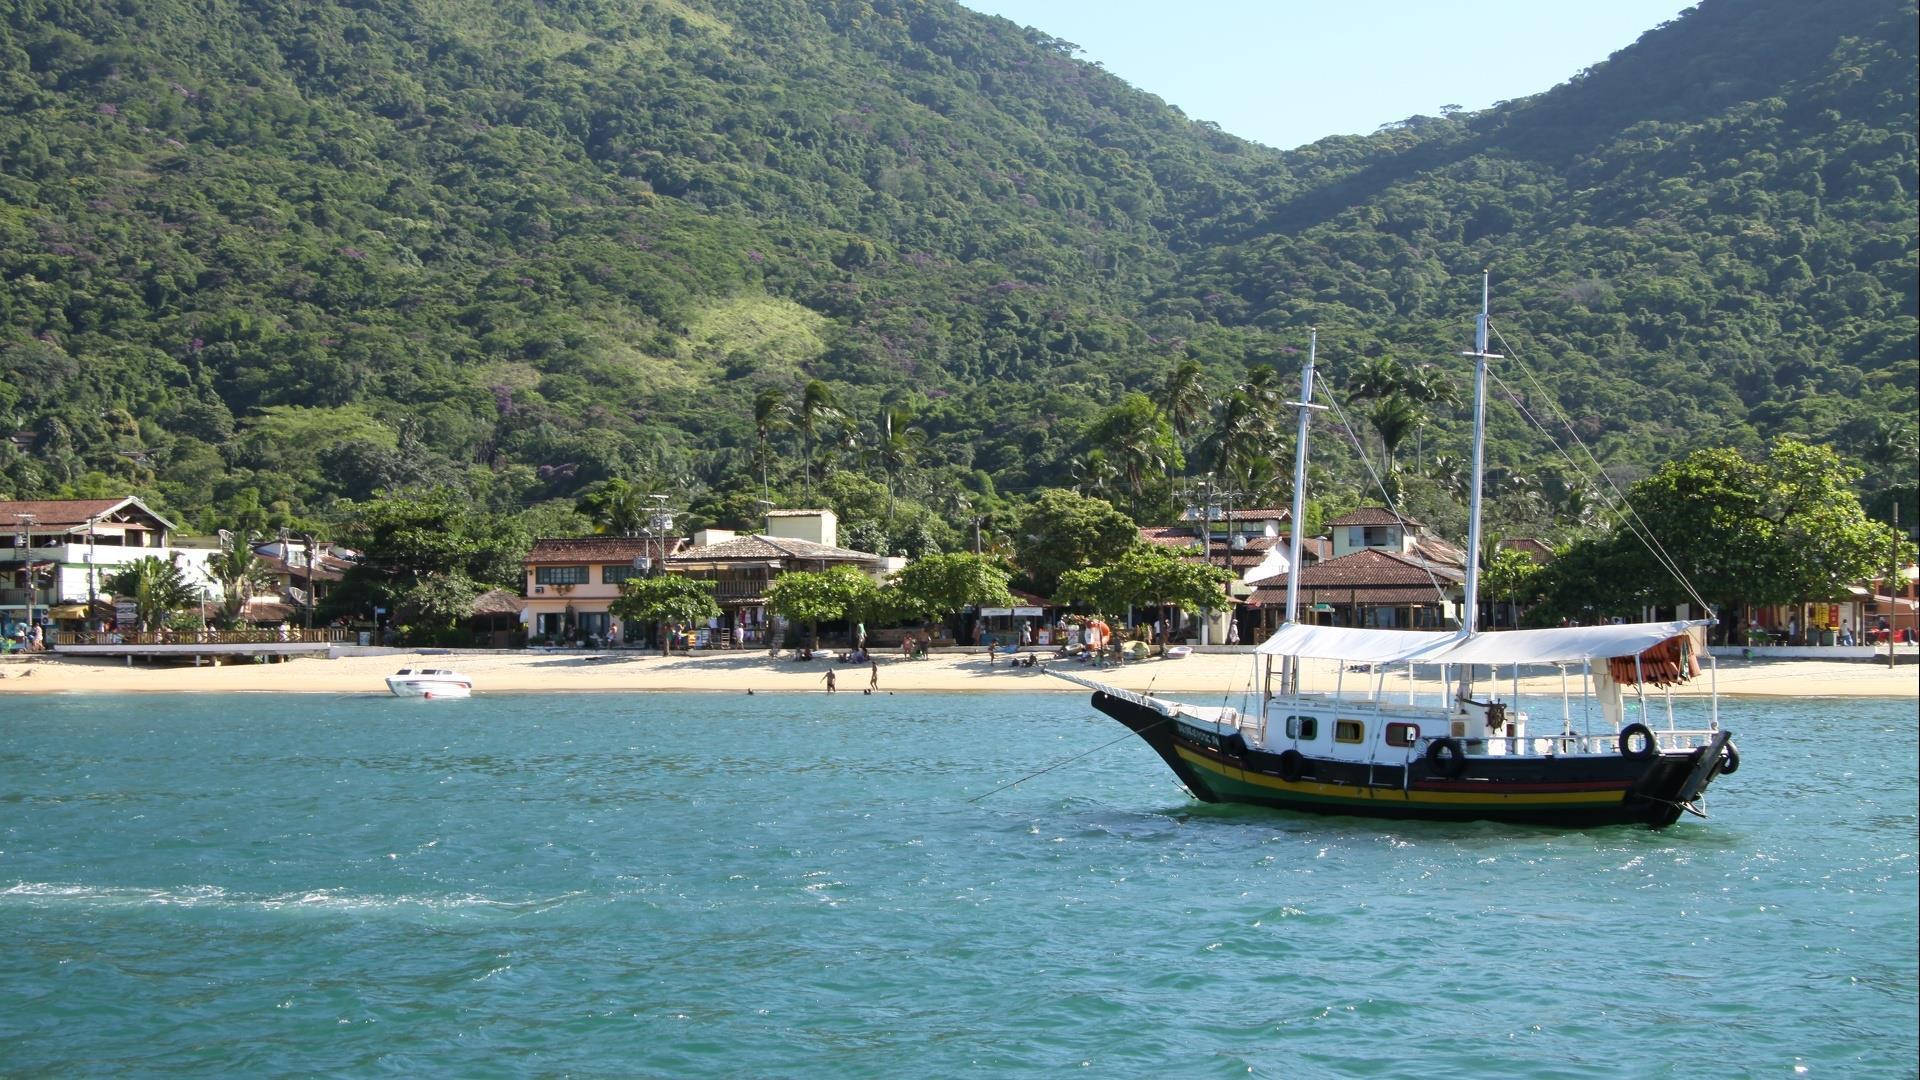 Brasilien Rio de Janeiro: 4 Tage Reisebaustein -  Ilha Grande naturnah erleben